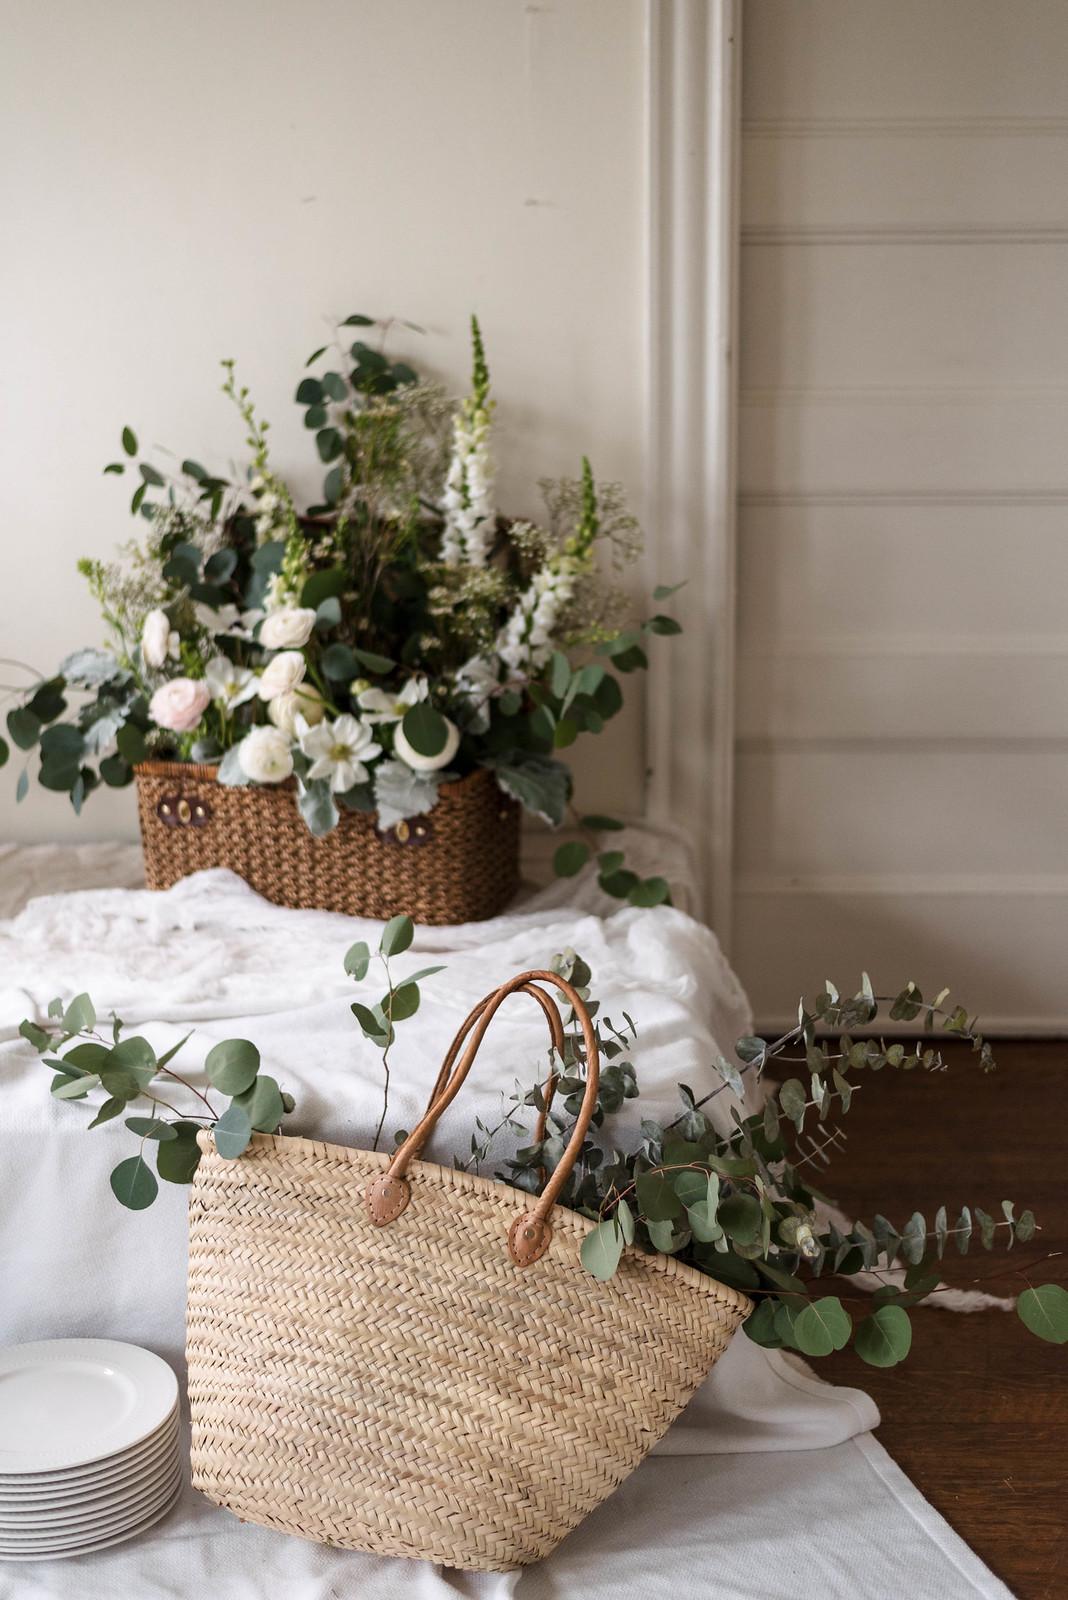 Market Bag Flowers on http://juliettelaura.blogspot.com/